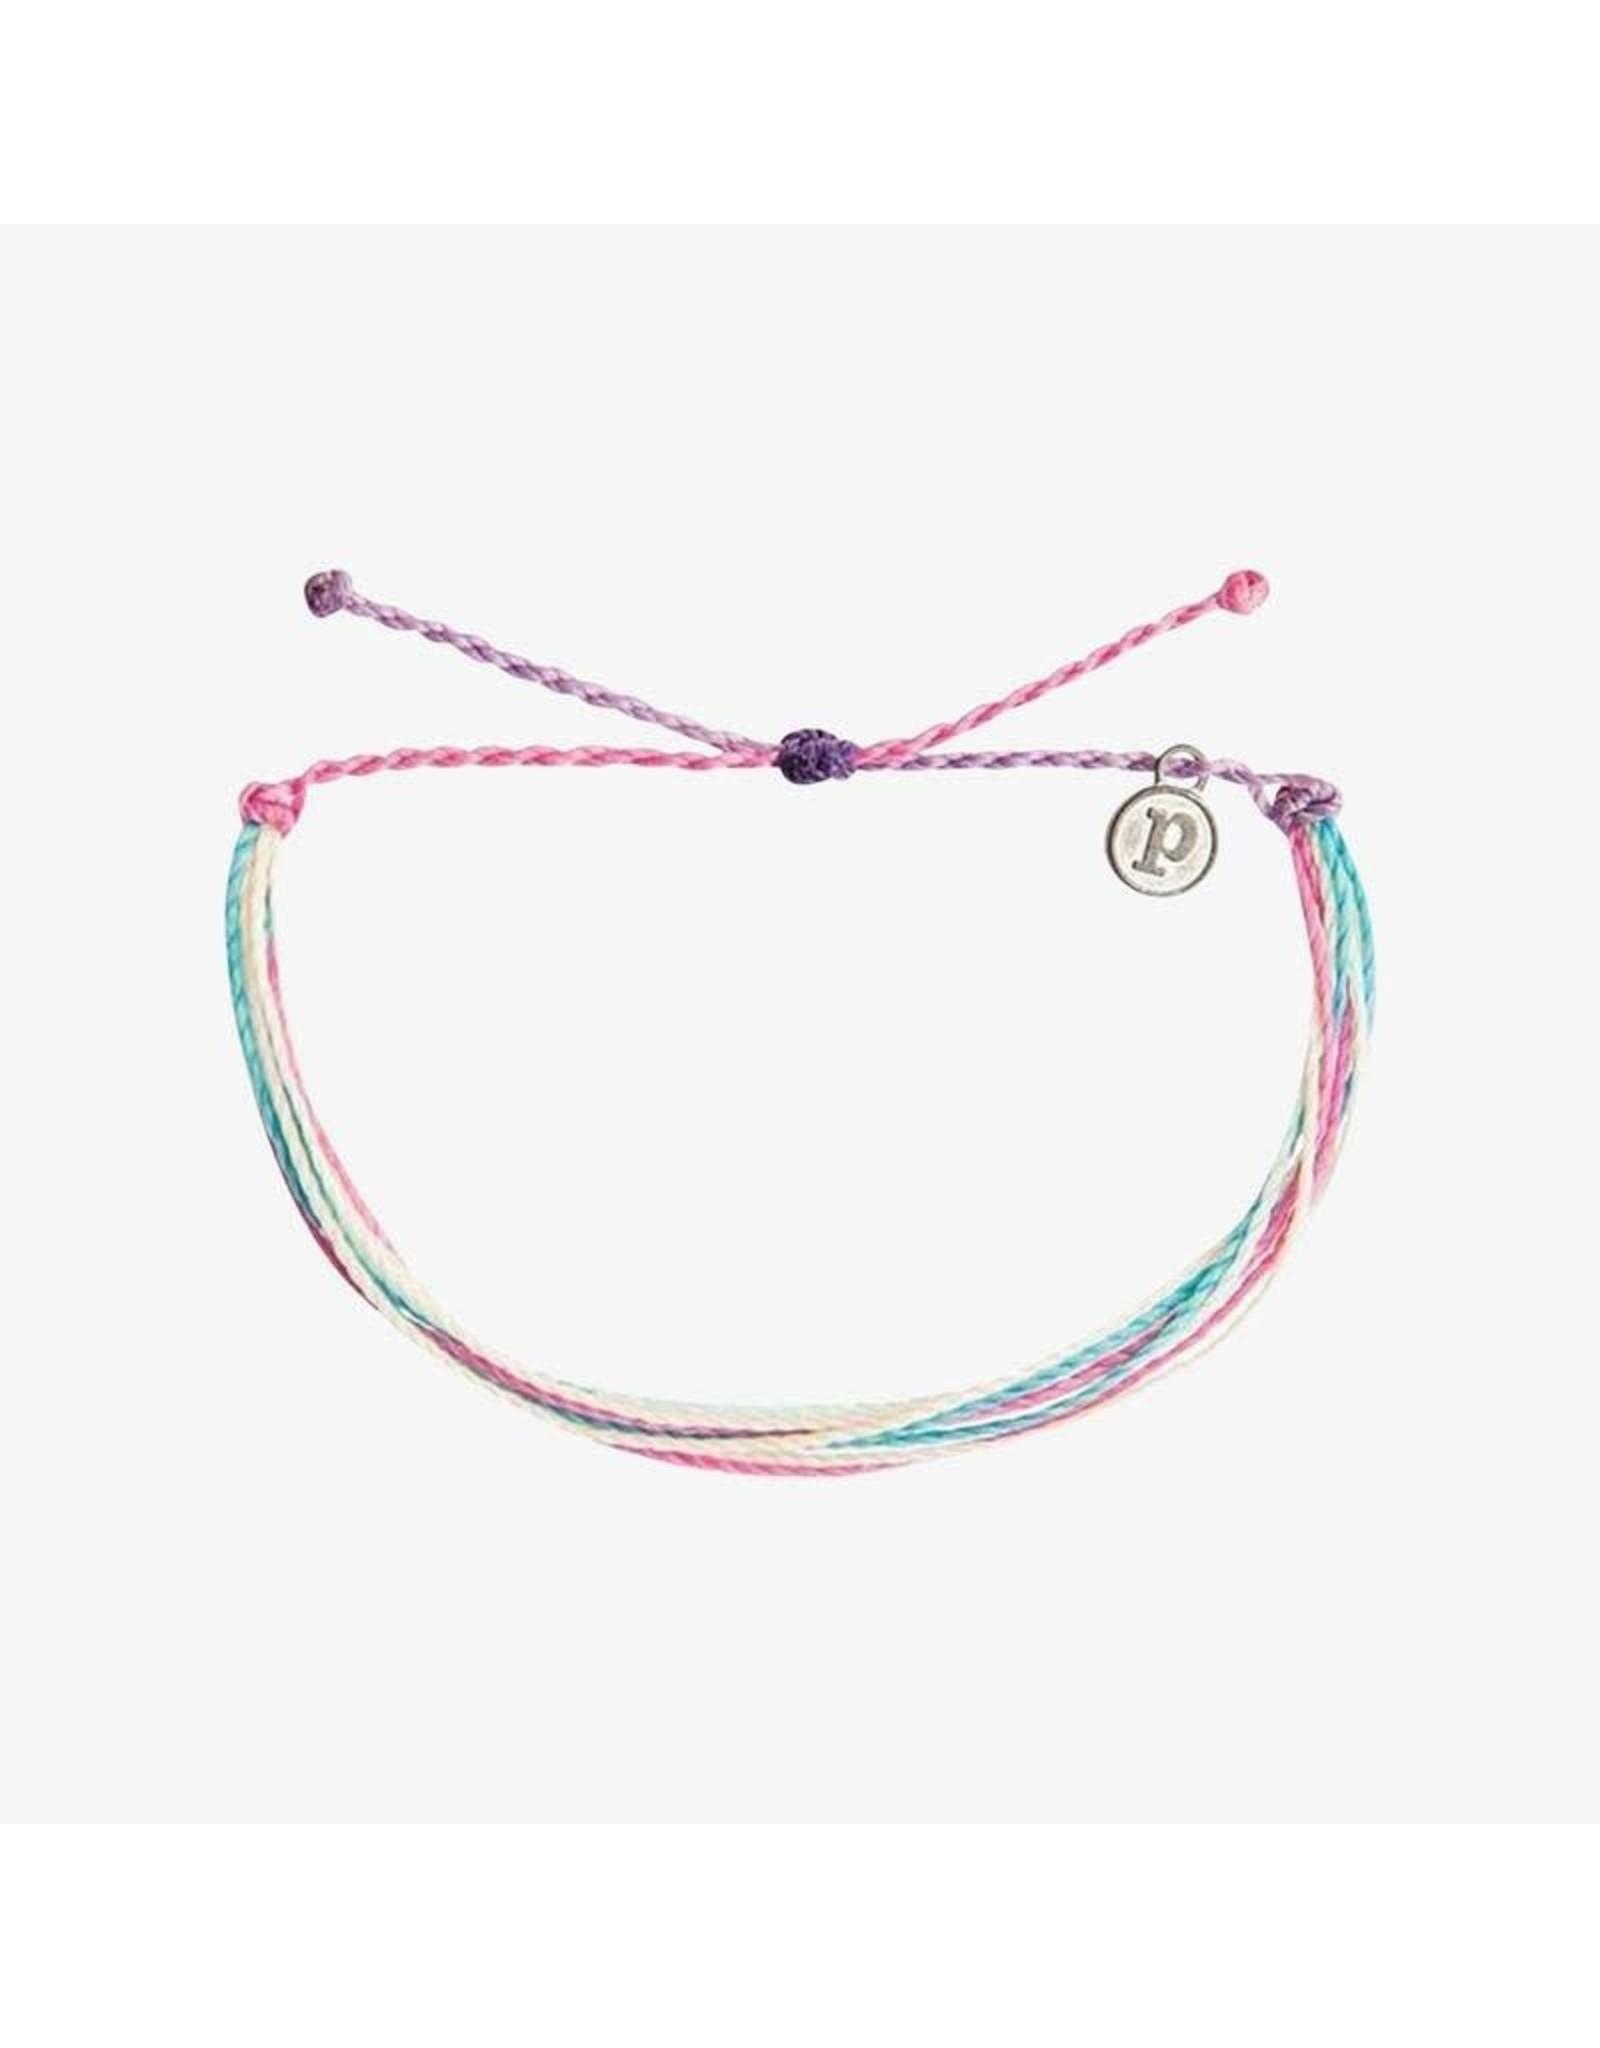 Pura Vida, Muted Original  Bracelet, Rose Quartz